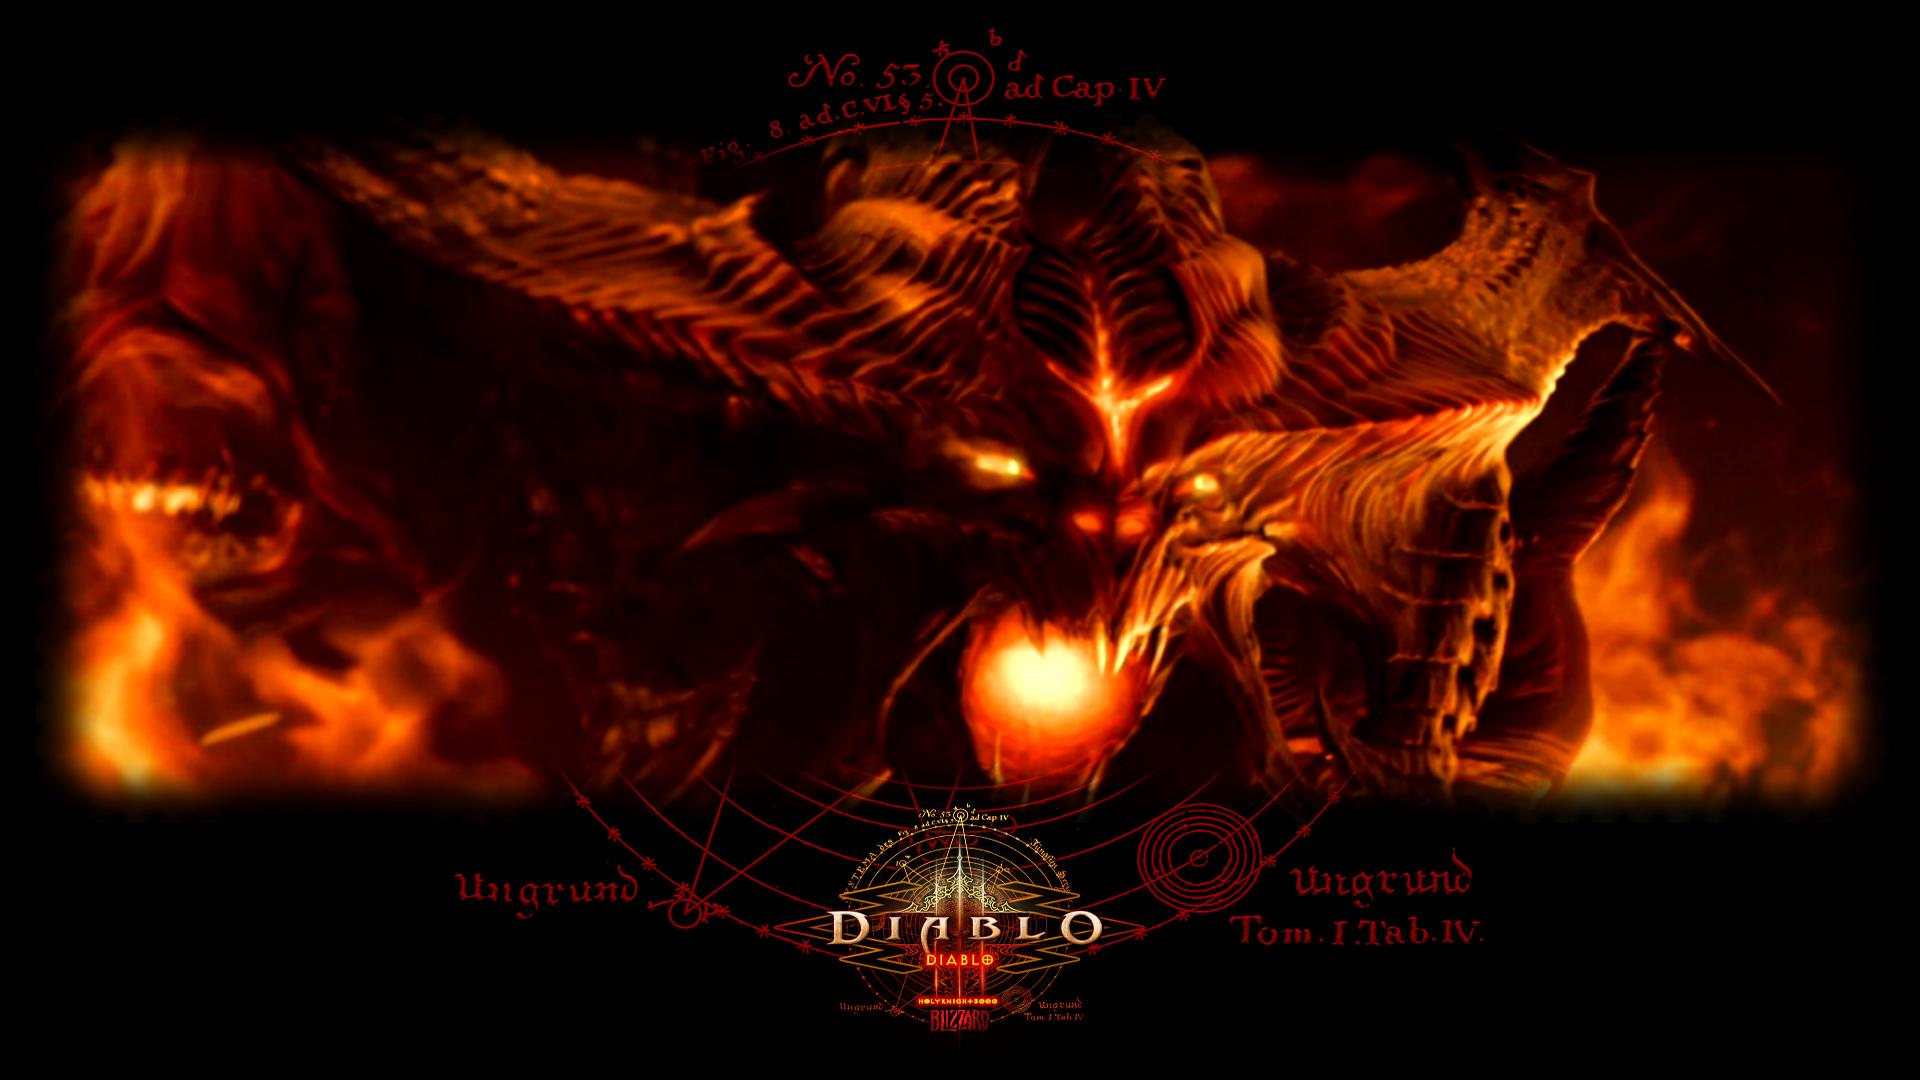 Diablo 3 Wallpaper 1920x1080: Diablo 3 Wallpaper 1080p